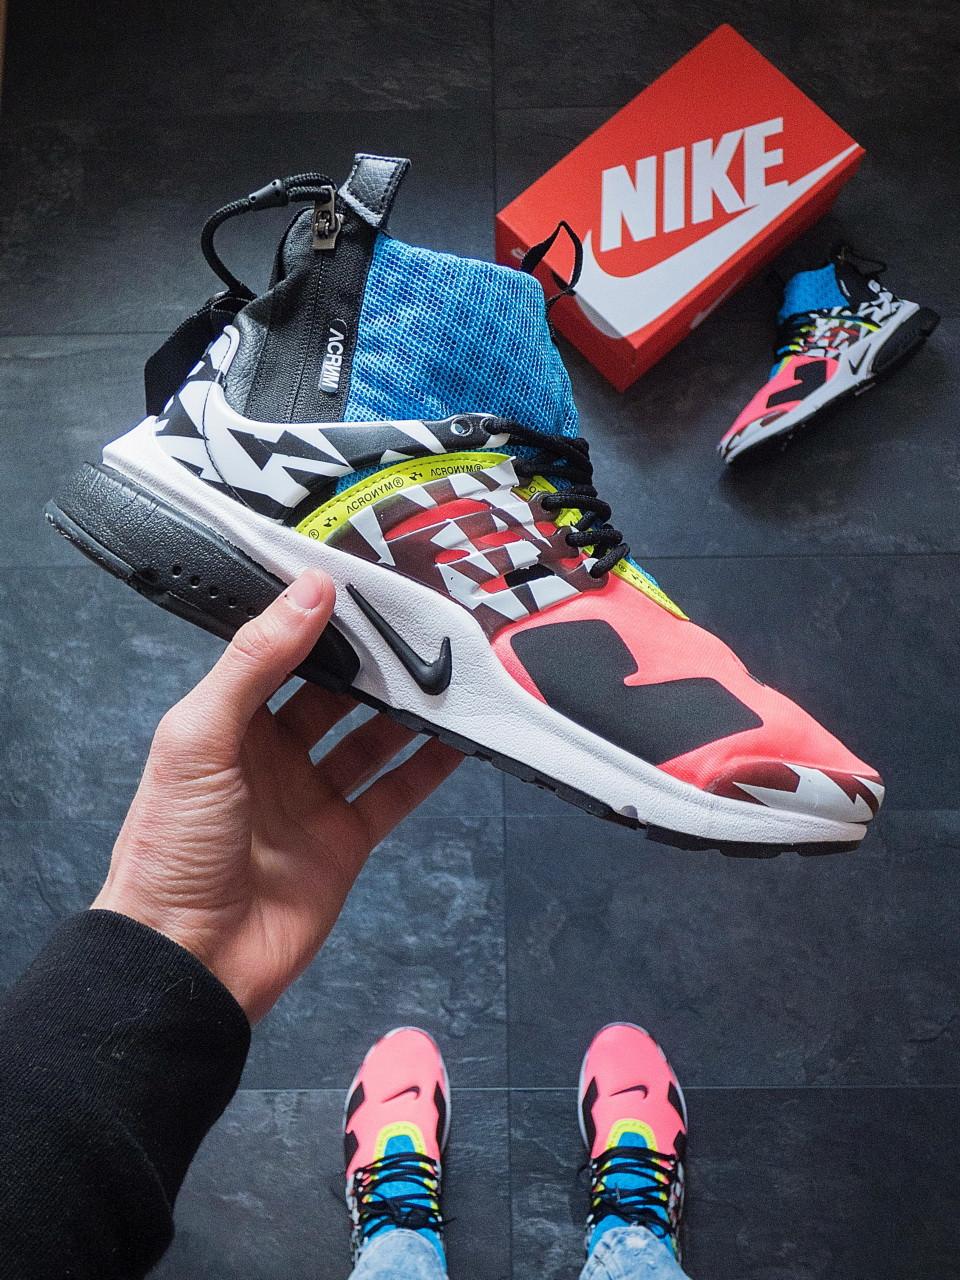 Мужские кроссовки Nike presto acronym pink 44 размер